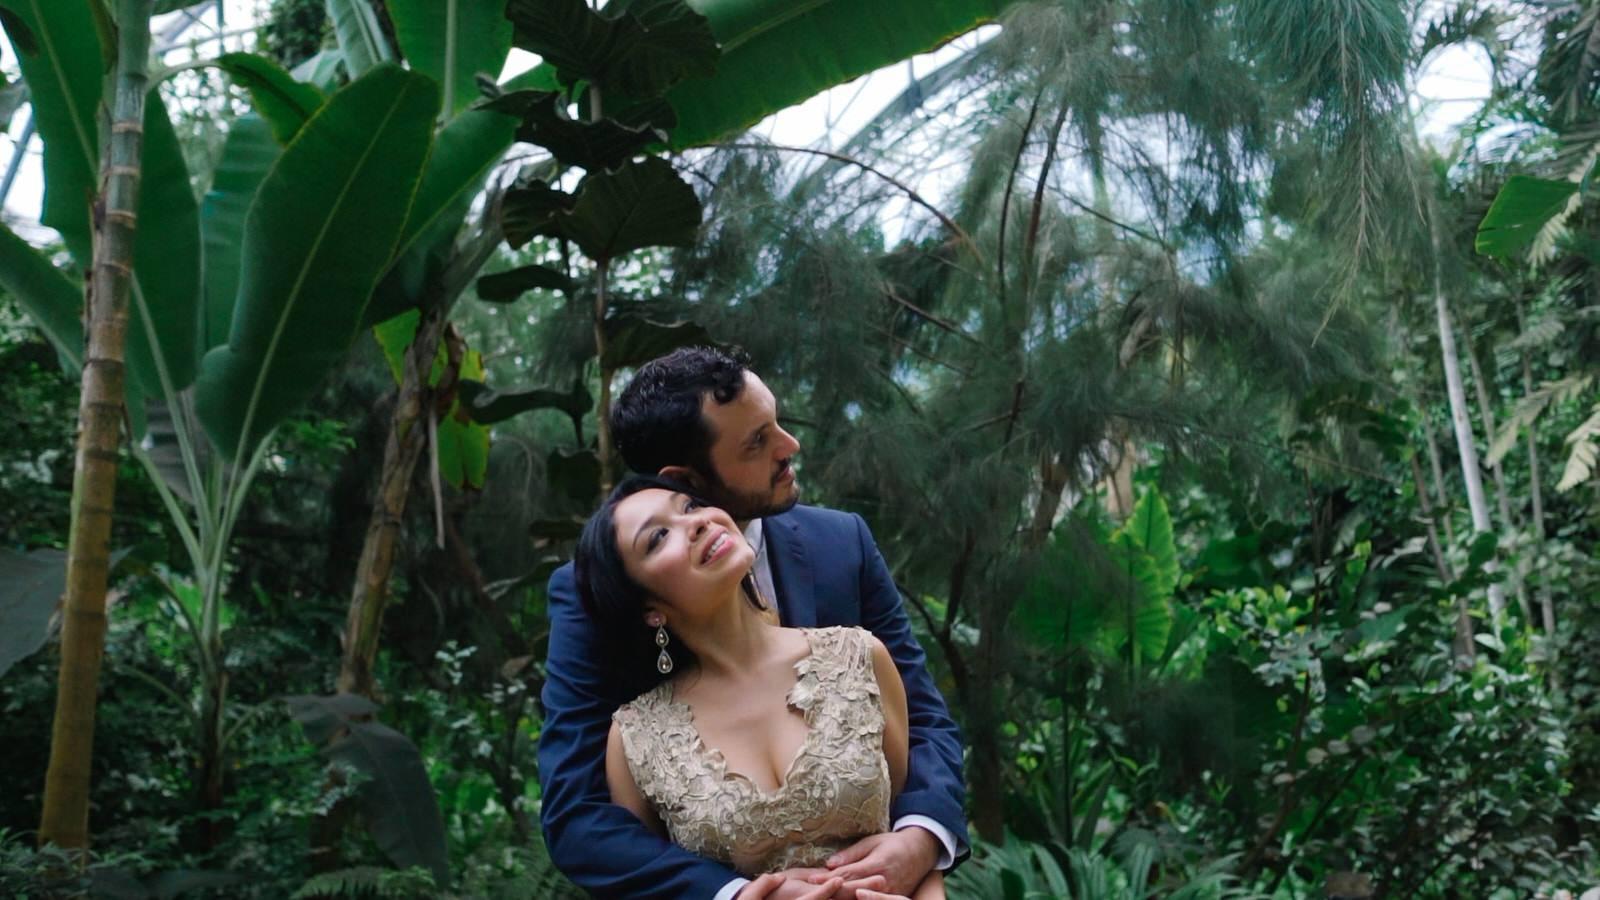 Wedding videography and photography FAQ